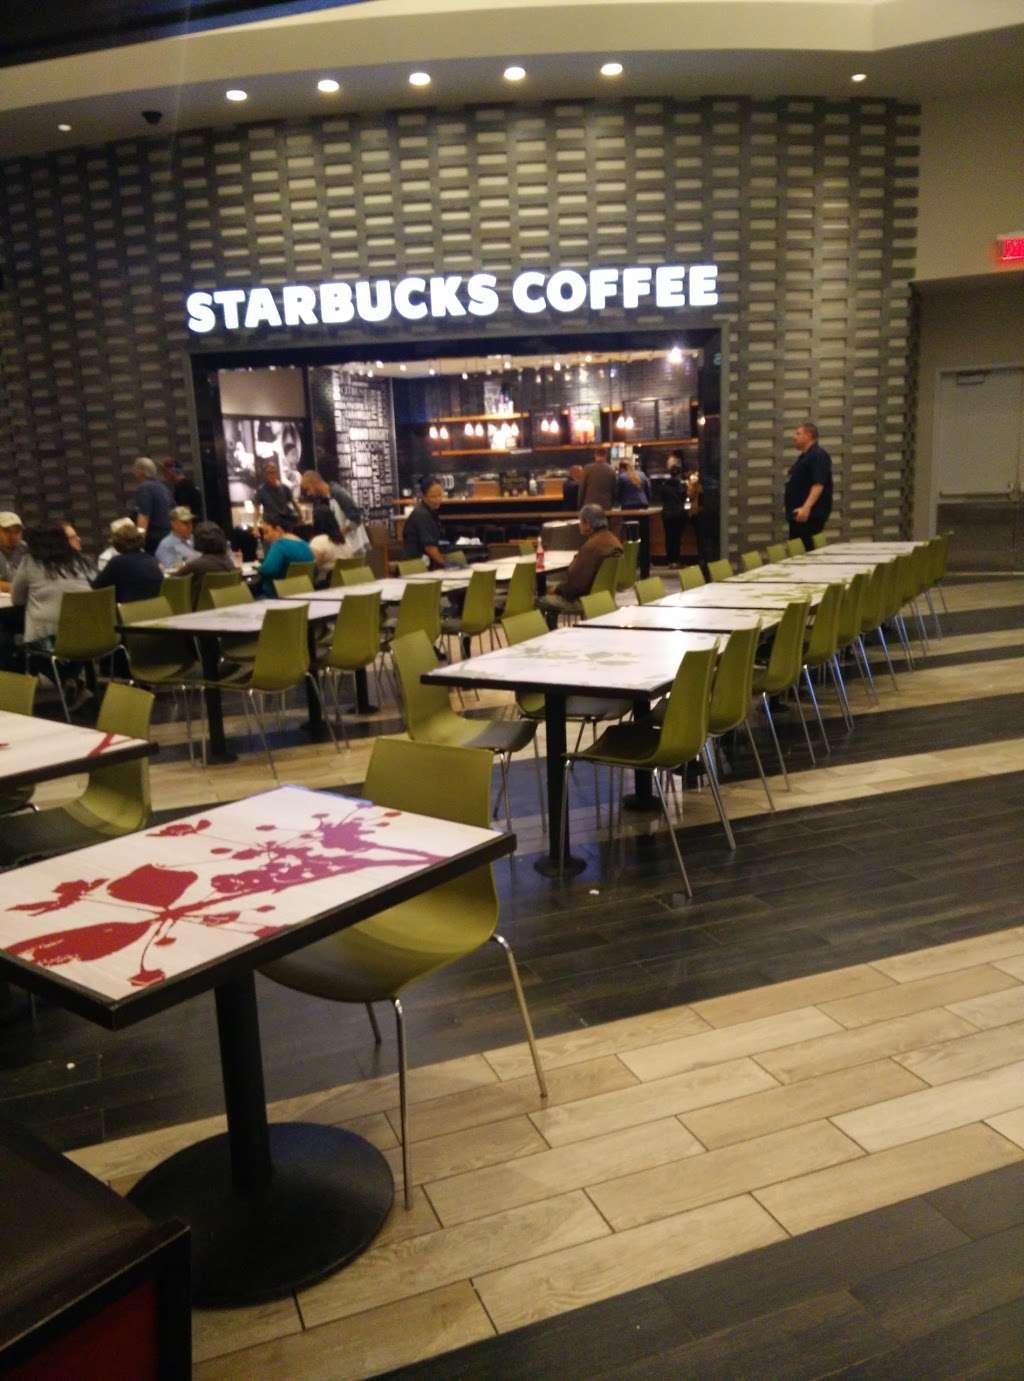 Starbucks - cafe  | Photo 2 of 2 | Address: 630 Park Ct, Rohnert Park, CA 94928, USA | Phone: (707) 588-7290